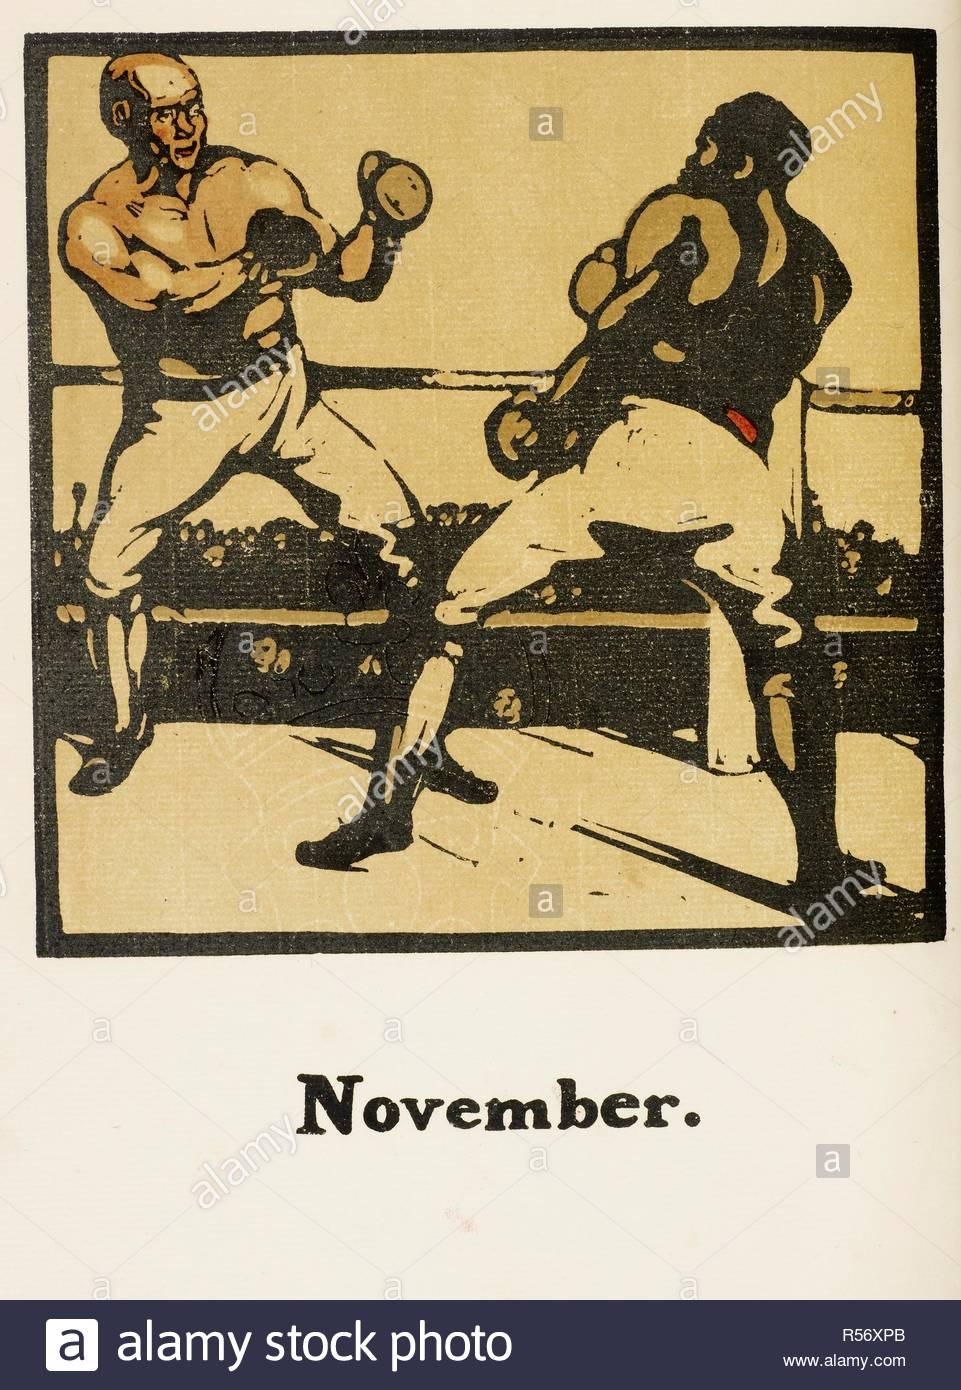 Calendario Sportivo.Immagine Da Un Calendario Sportivo Novembre Due Pugili